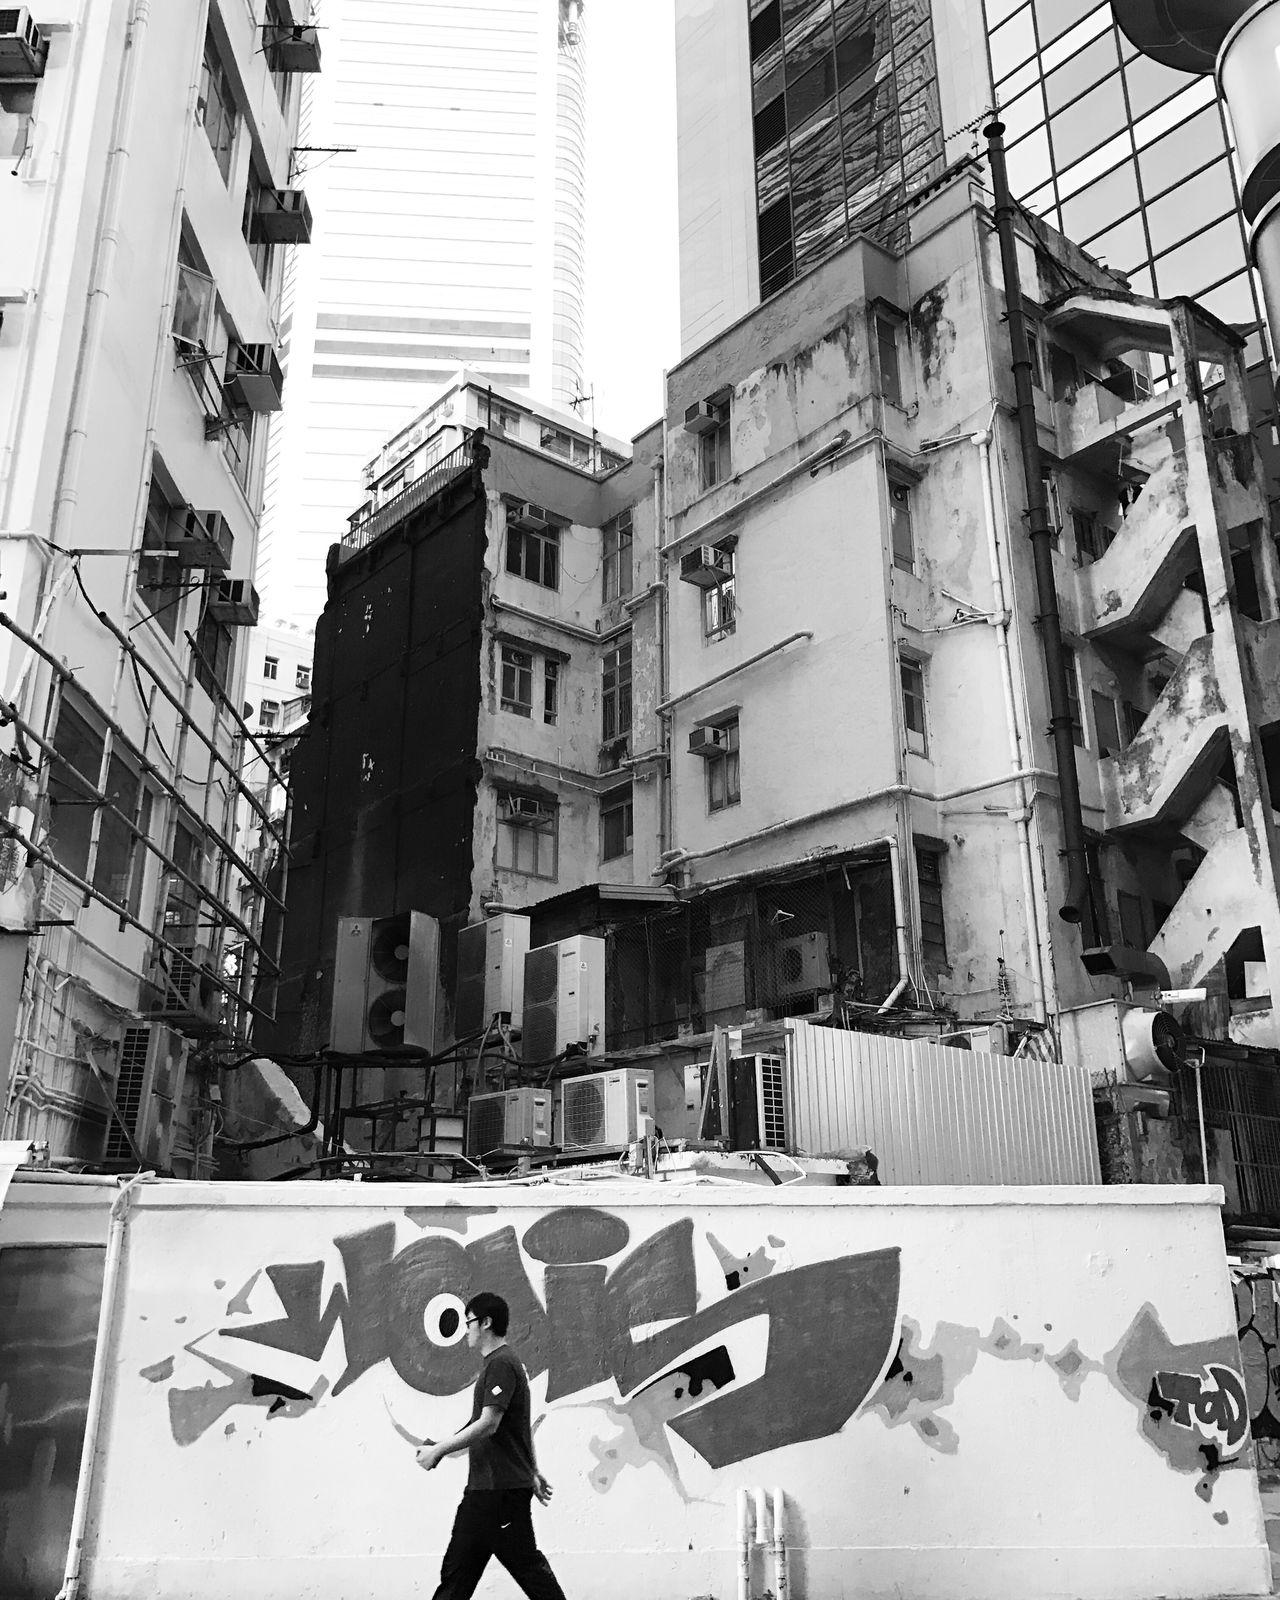 Blackandwhite Osanpo Camera | Strideby Street Art